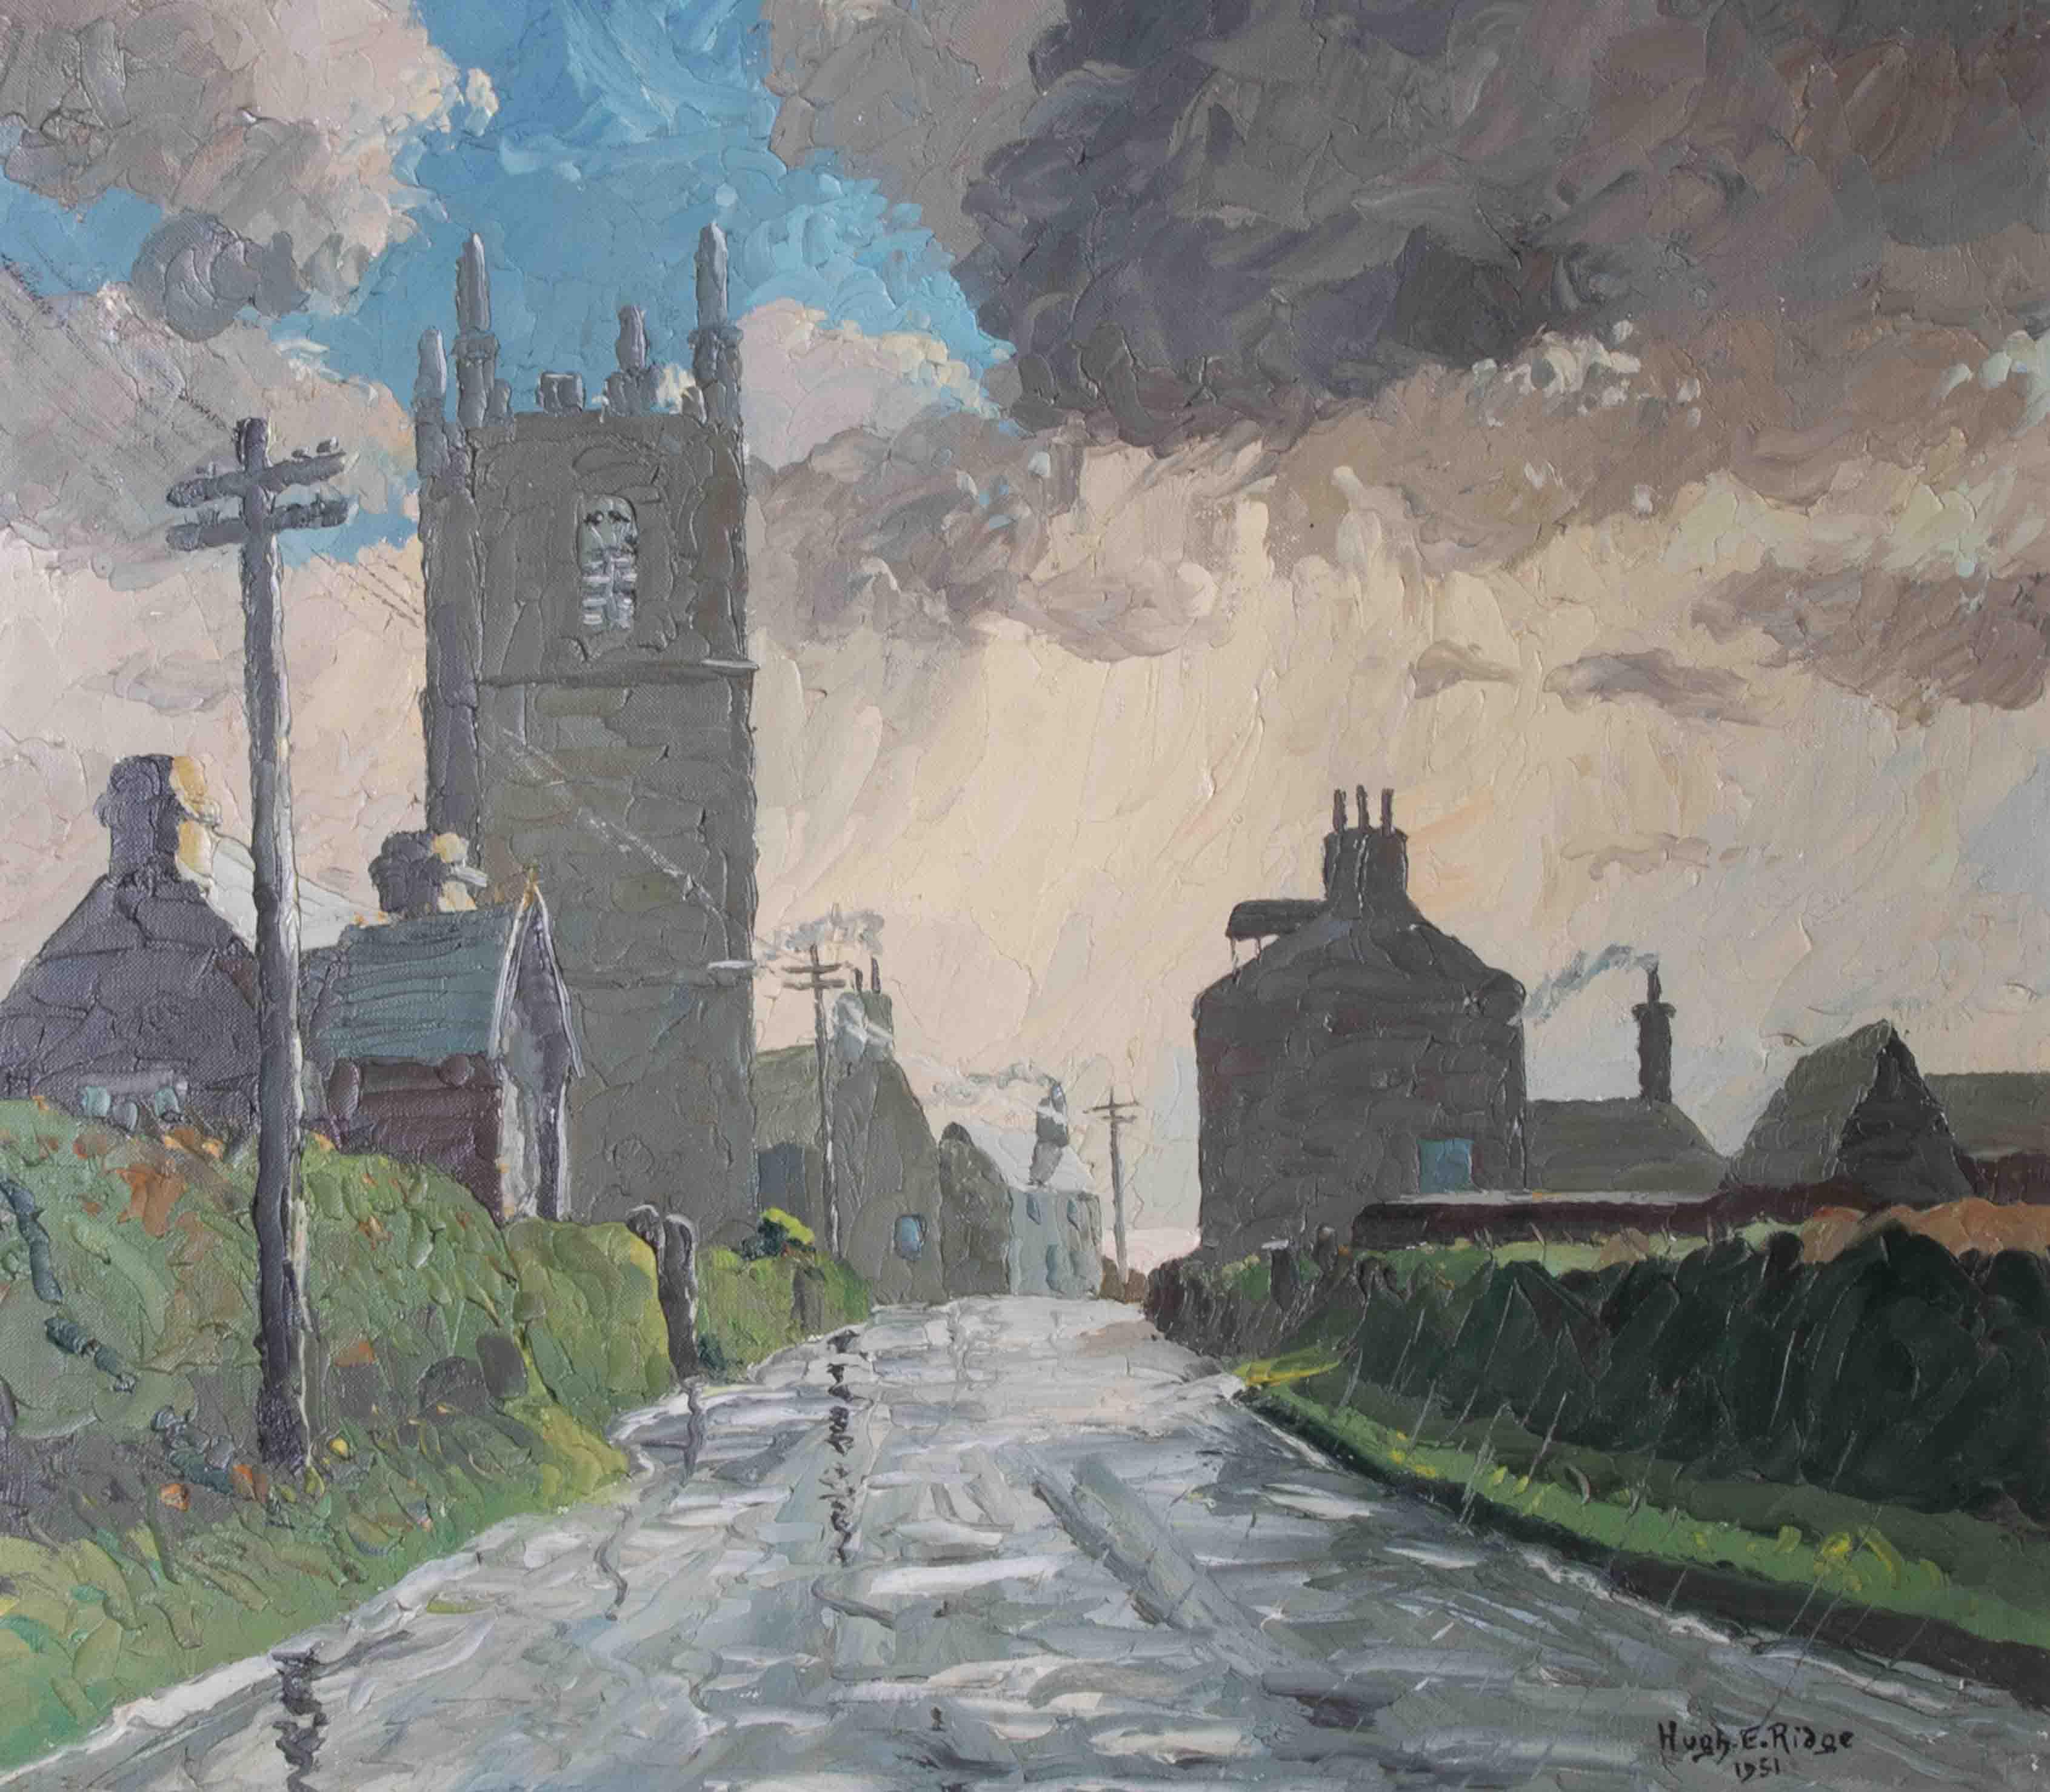 Hugh E Ridge (1899-1976) 'December Day, Sennen' signed oil on canvas, 38cm x 43cm, Exhibitors Back - Image 2 of 2